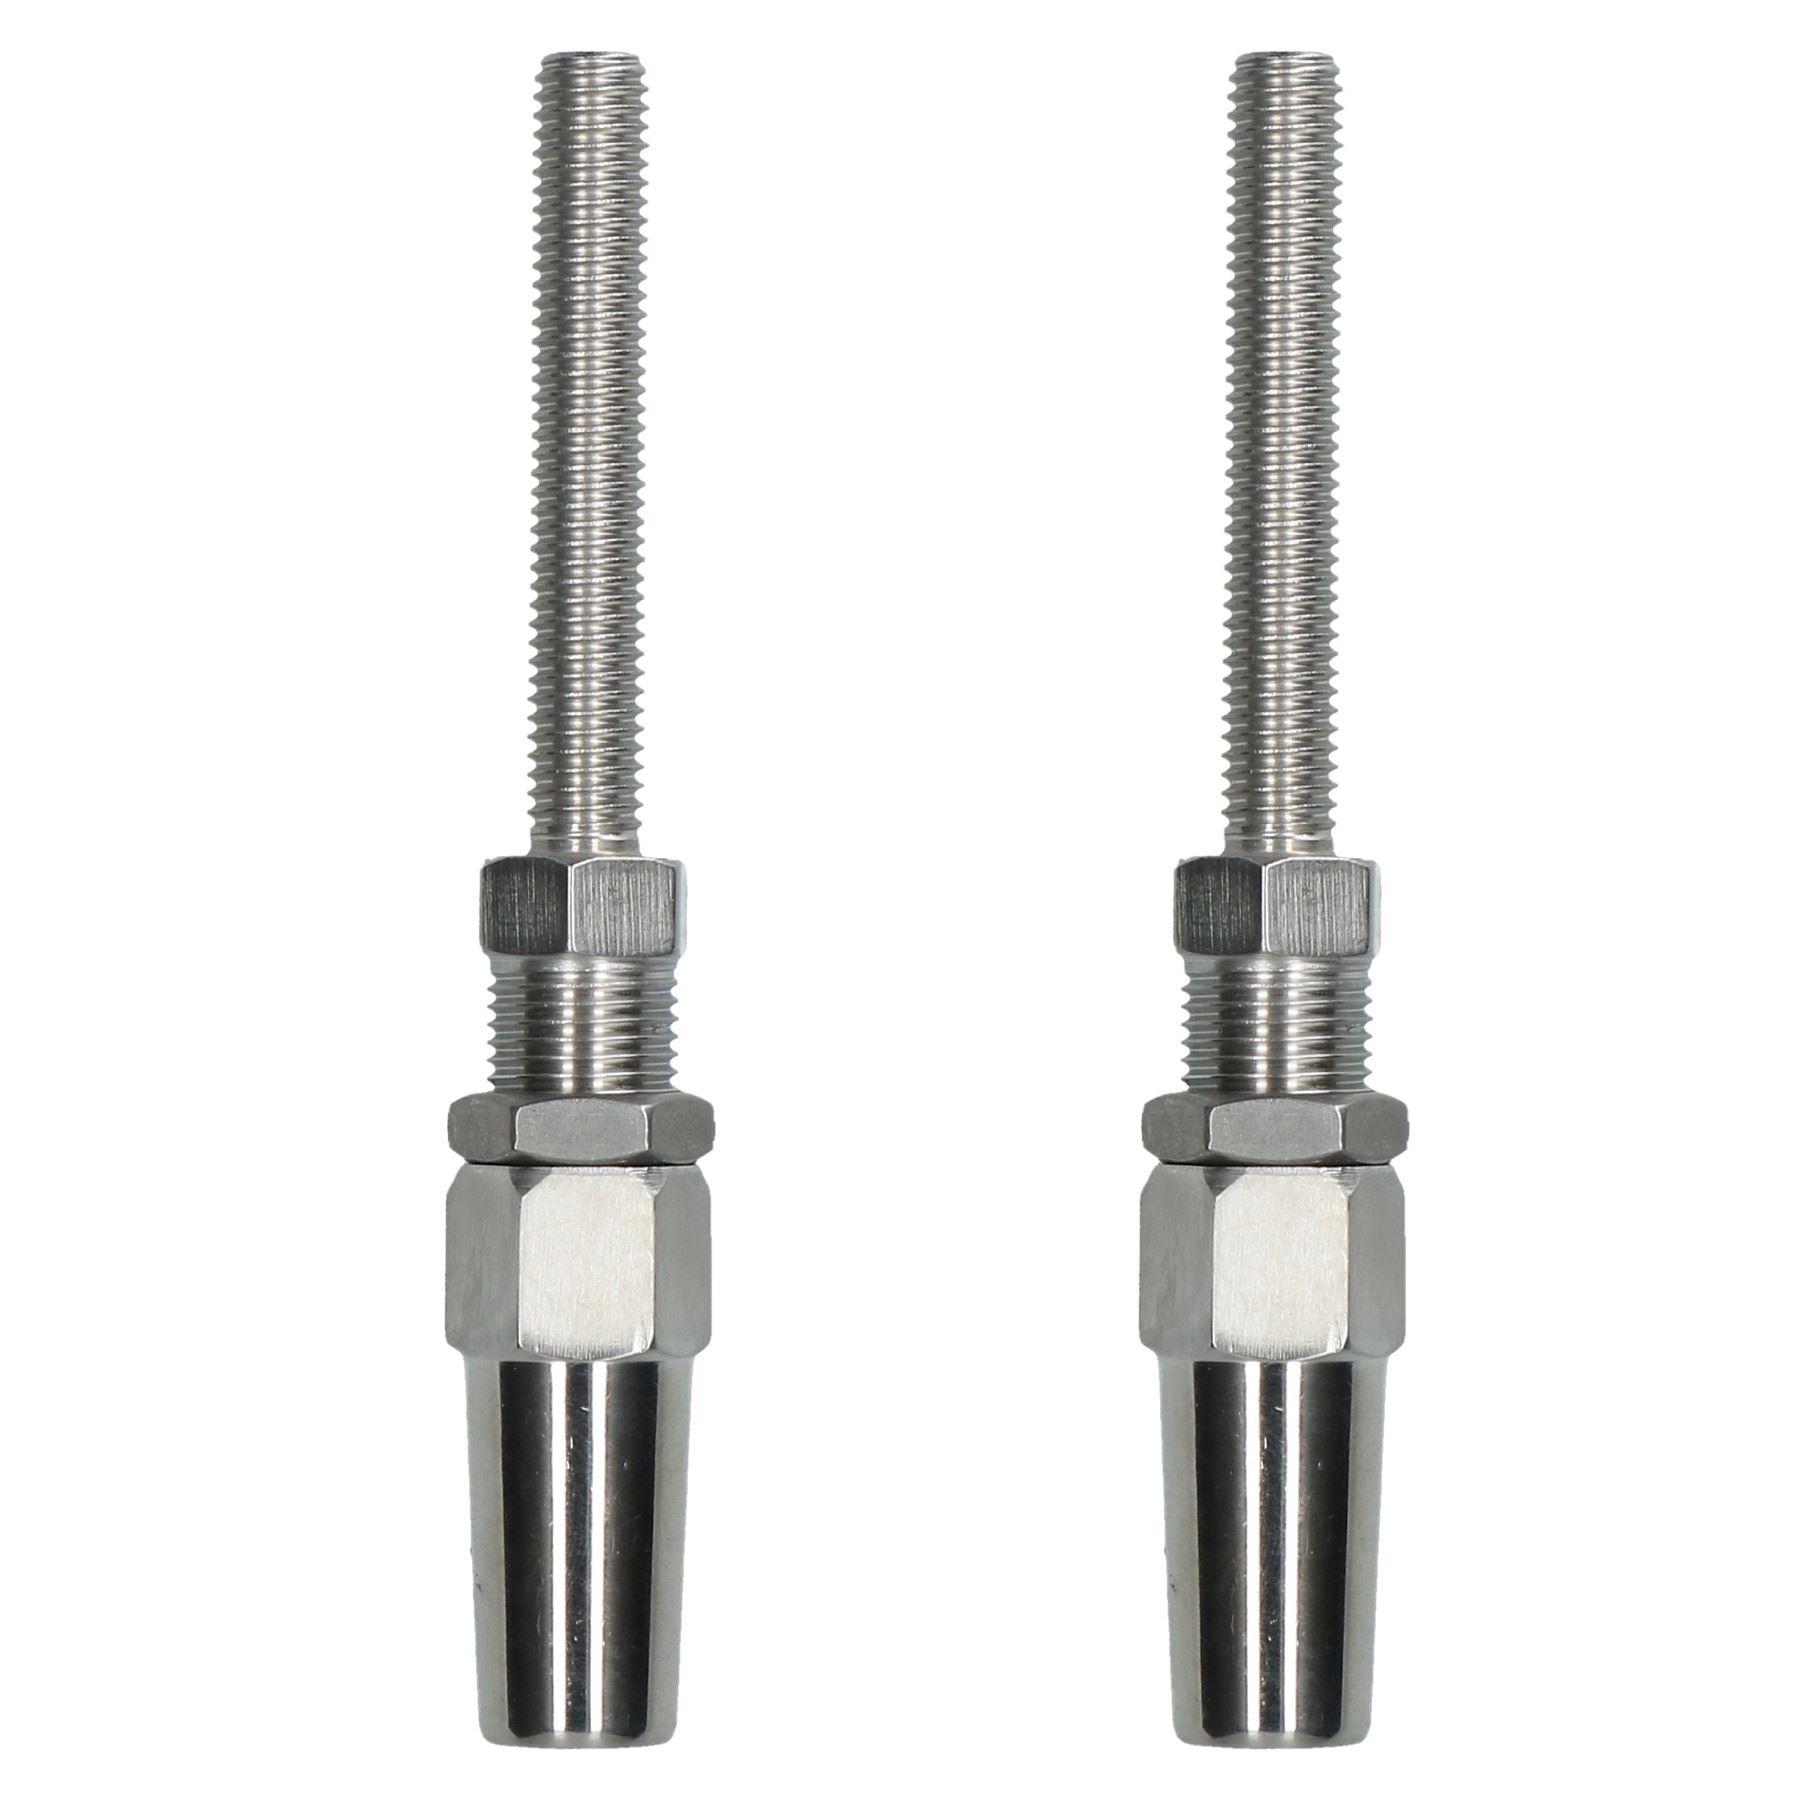 6mm Câble fil gréement corde Terminal Swageless goujon  inoxydable Montage 2 PK  brand on sale clearance